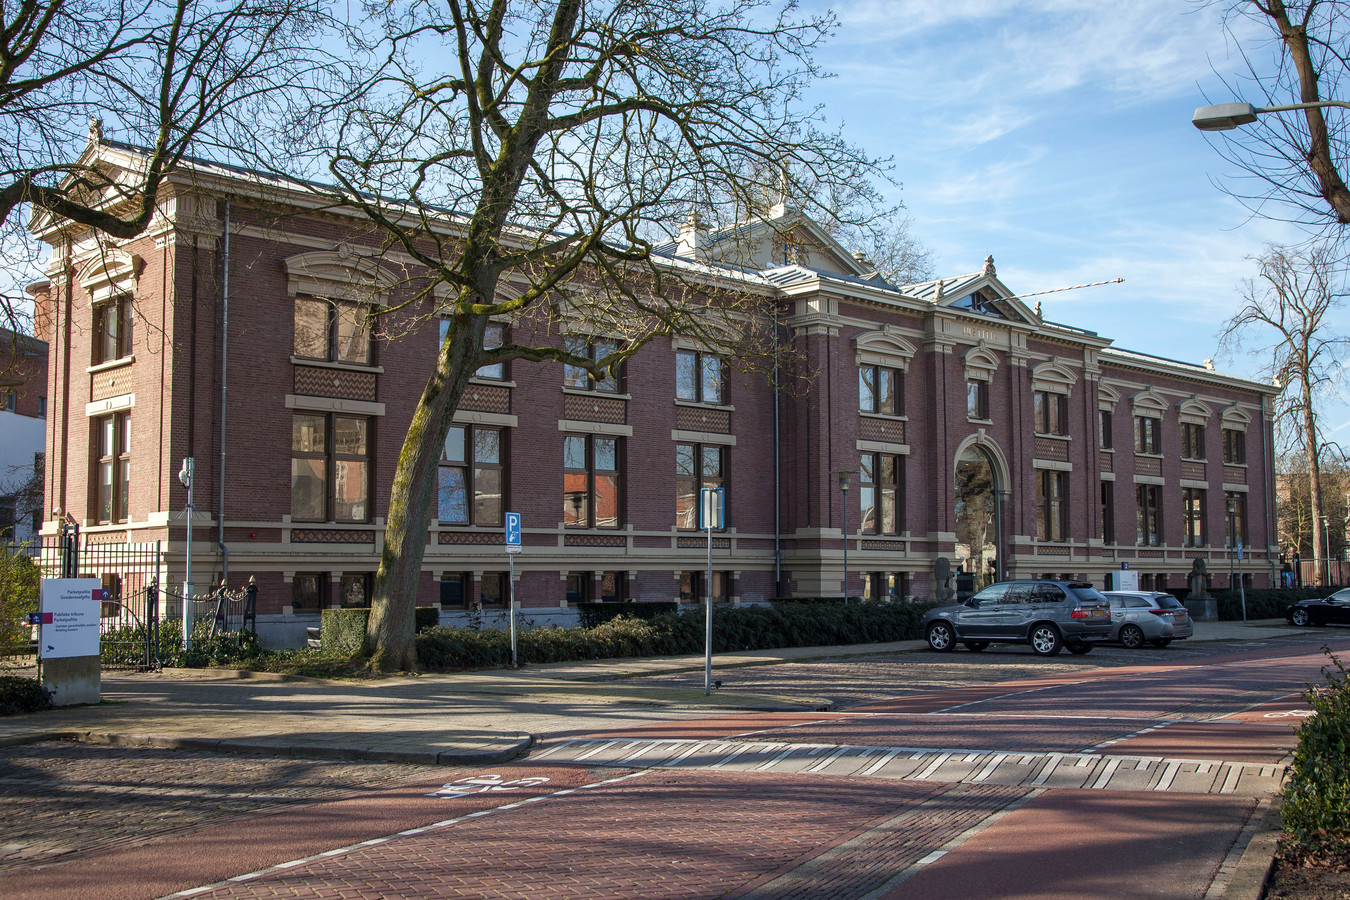 Rechtbank Gelderland locatie Zutphen.